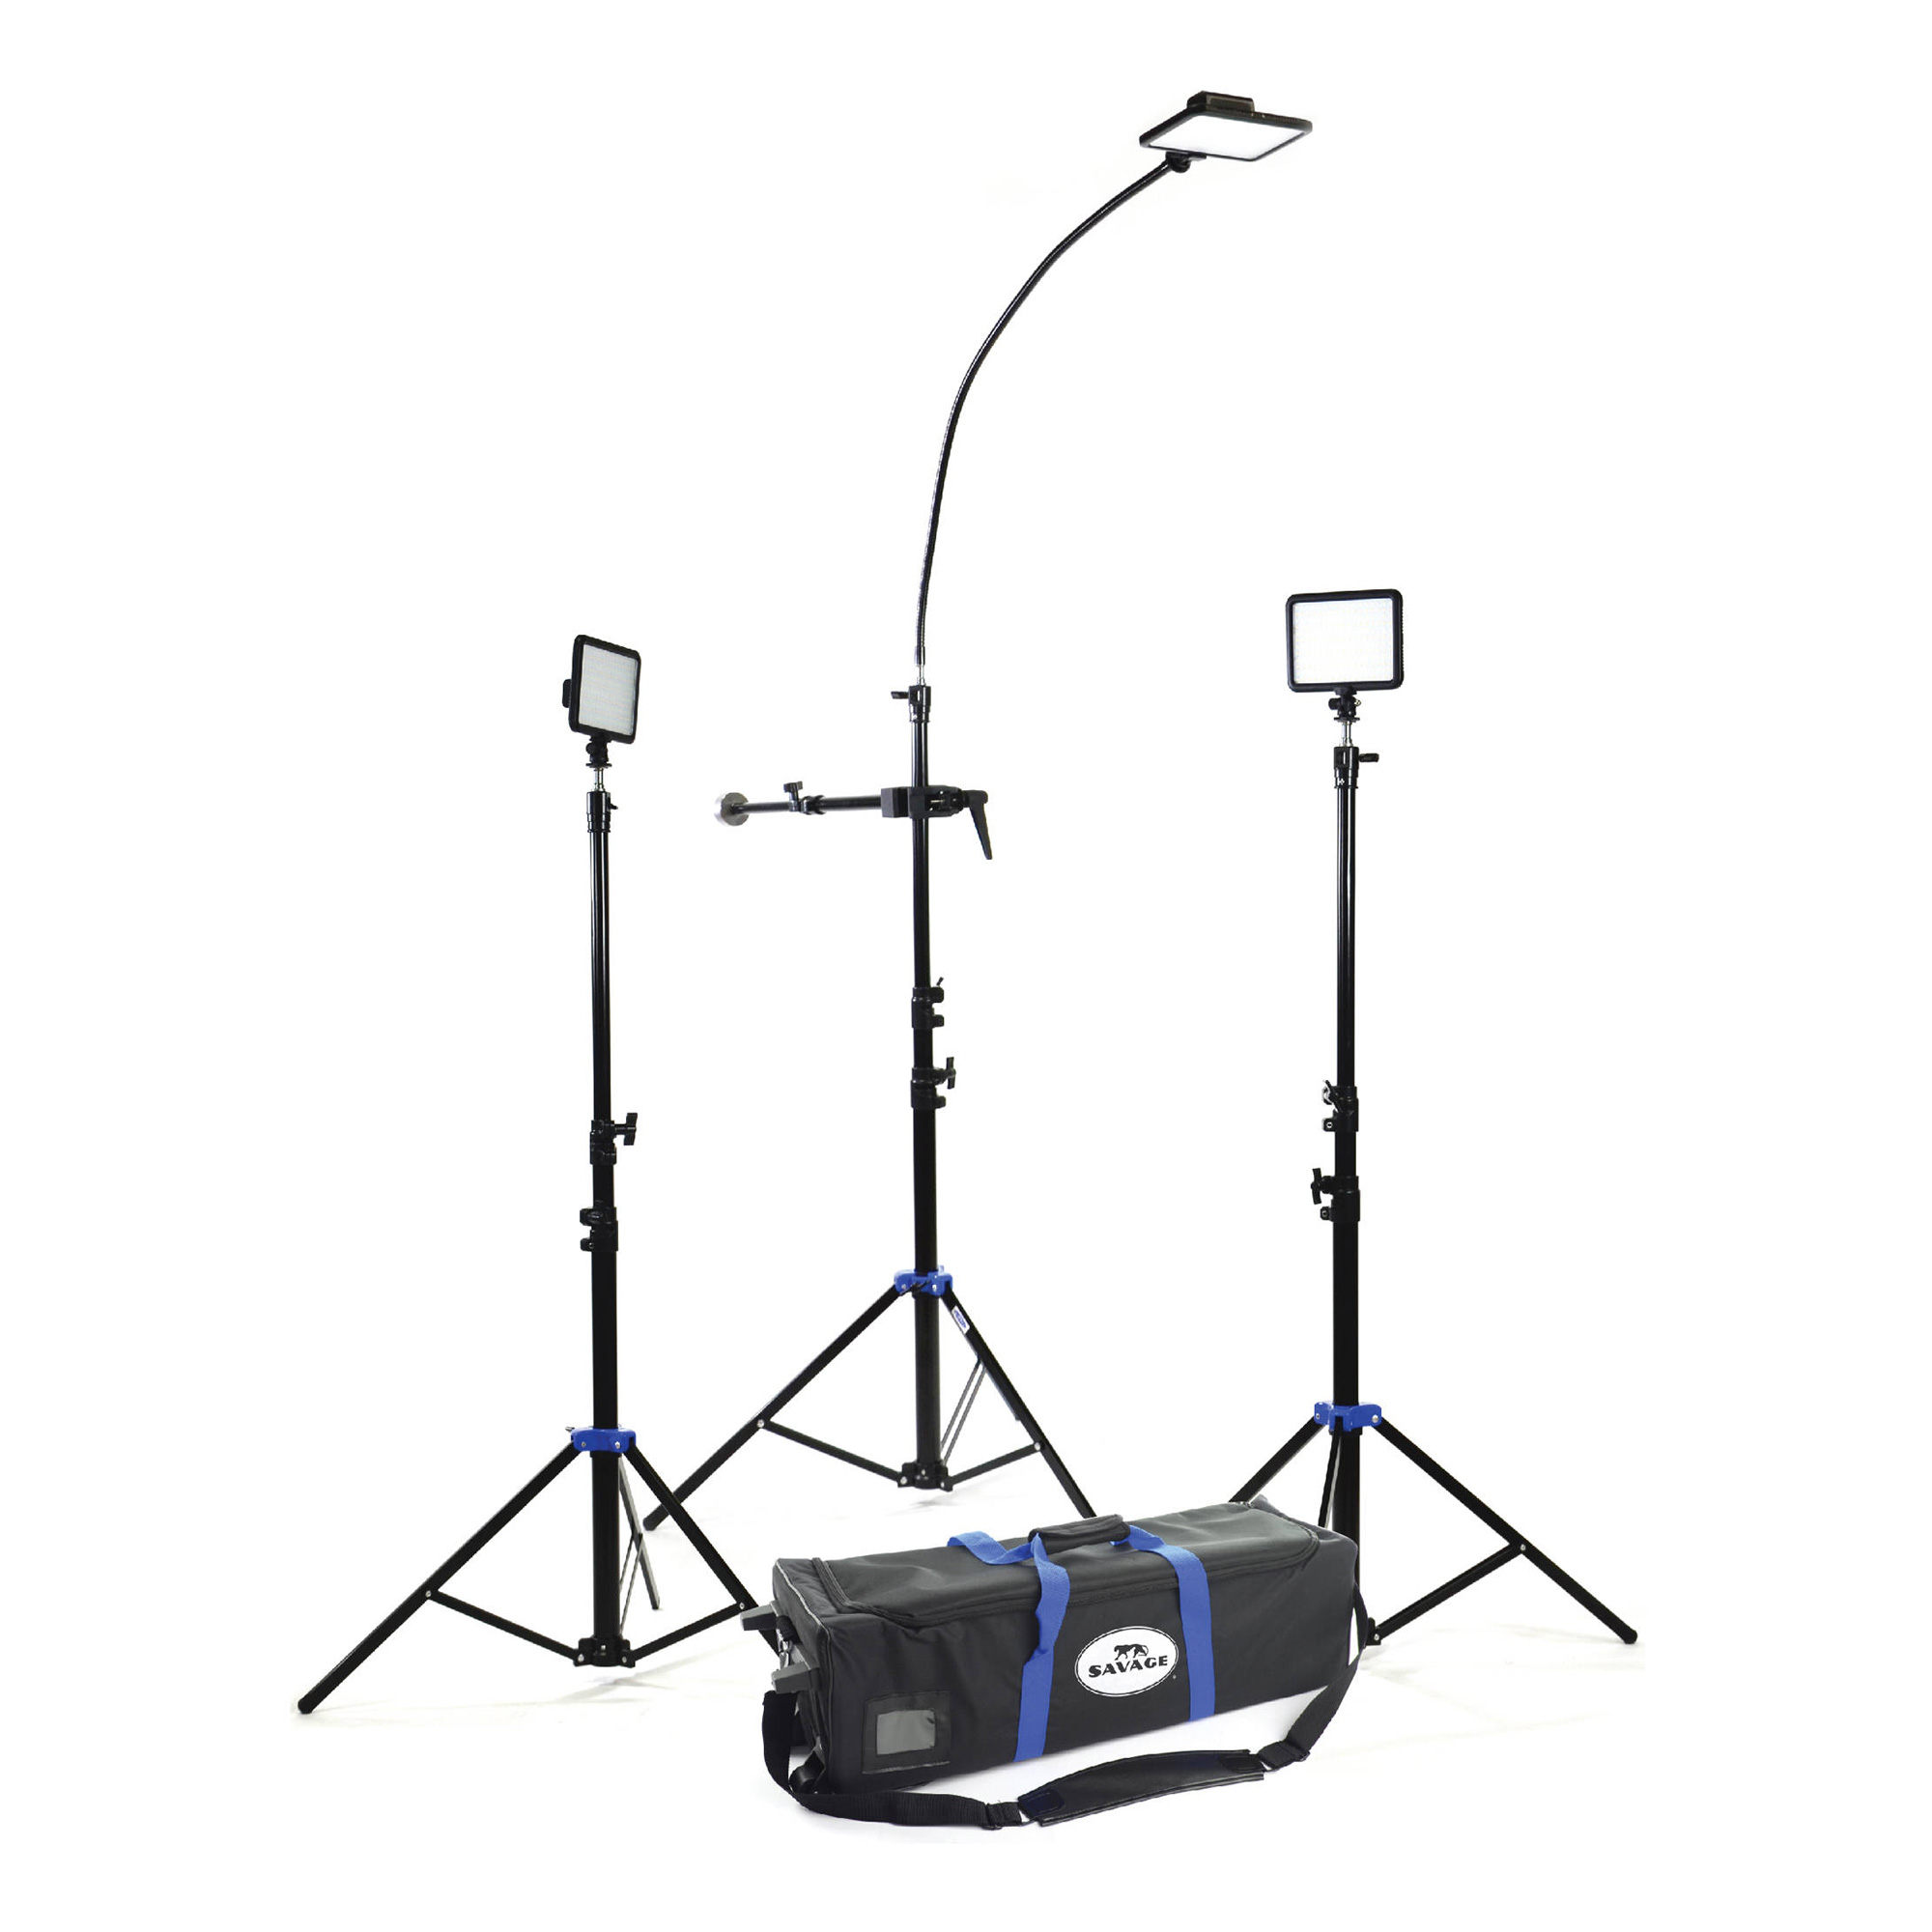 Savage   3 LED Cobra Interview Light Kit   INTV-3